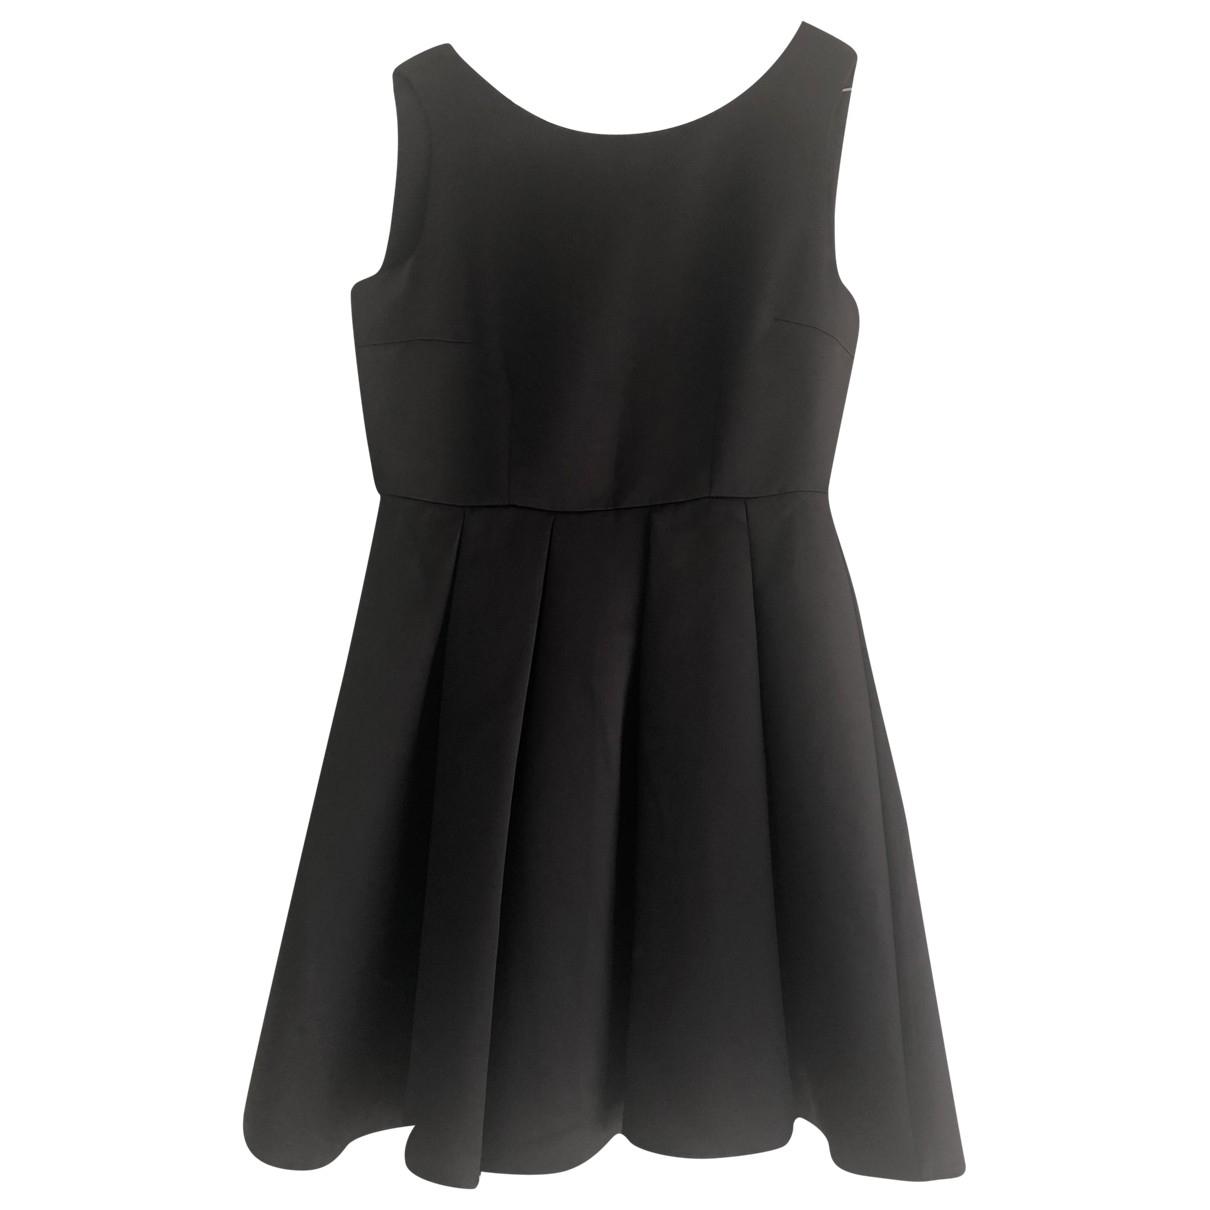 Darling N Black dress for Women 10 UK